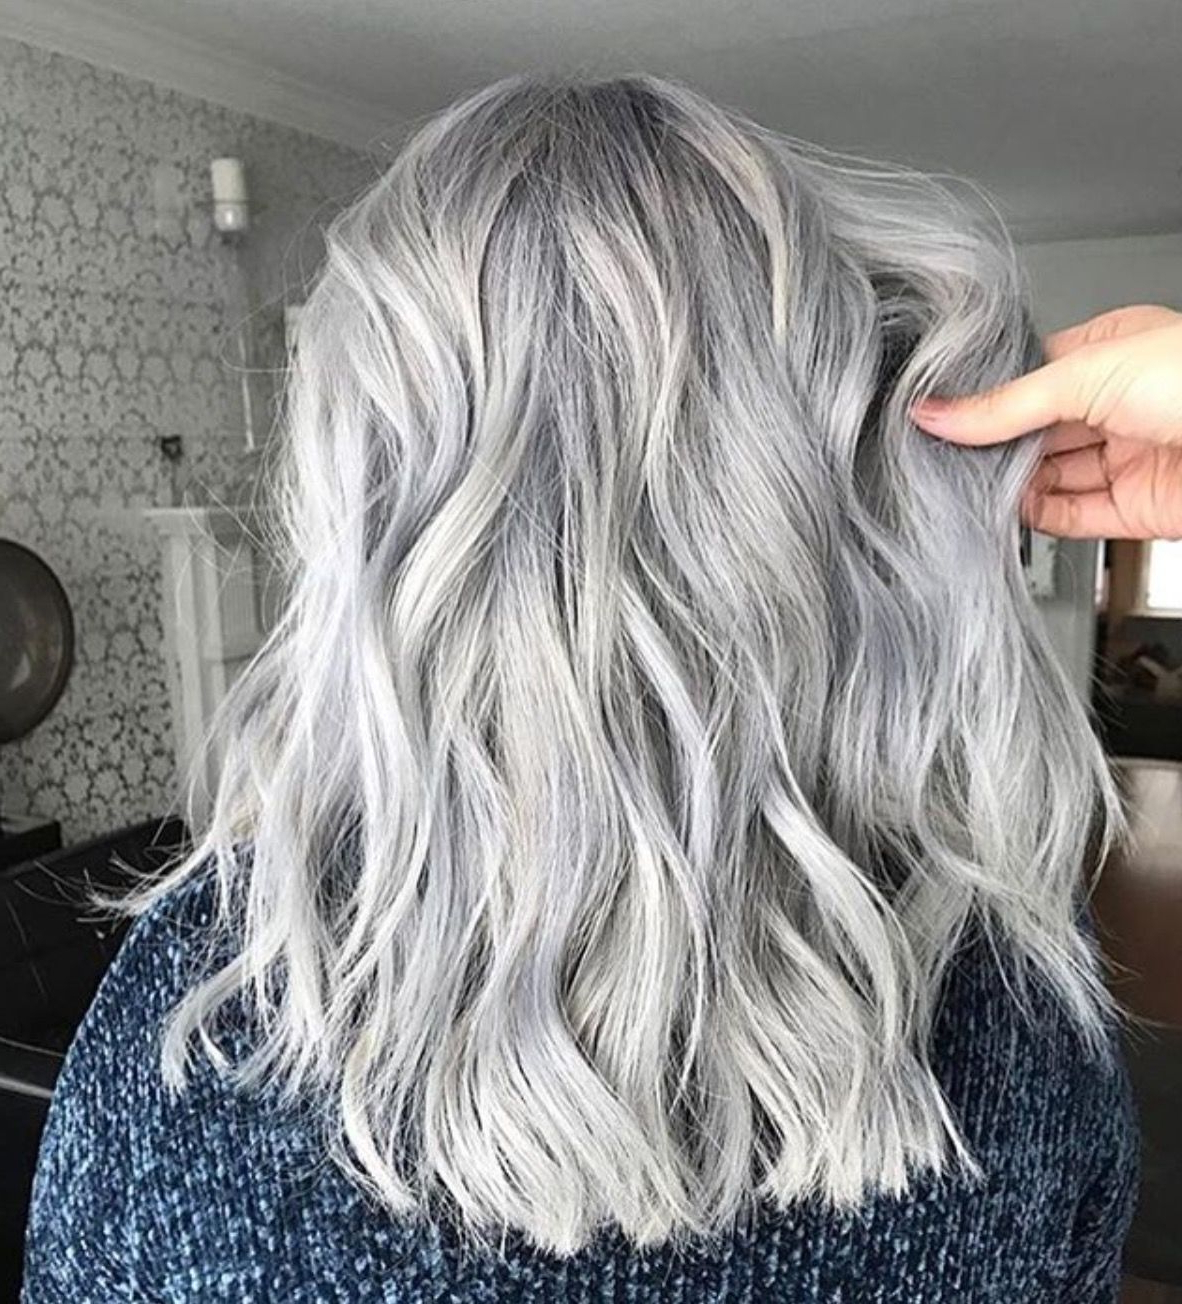 Fashion Regarding Popular Medium Silver Layers Hairstyles (View 9 of 20)